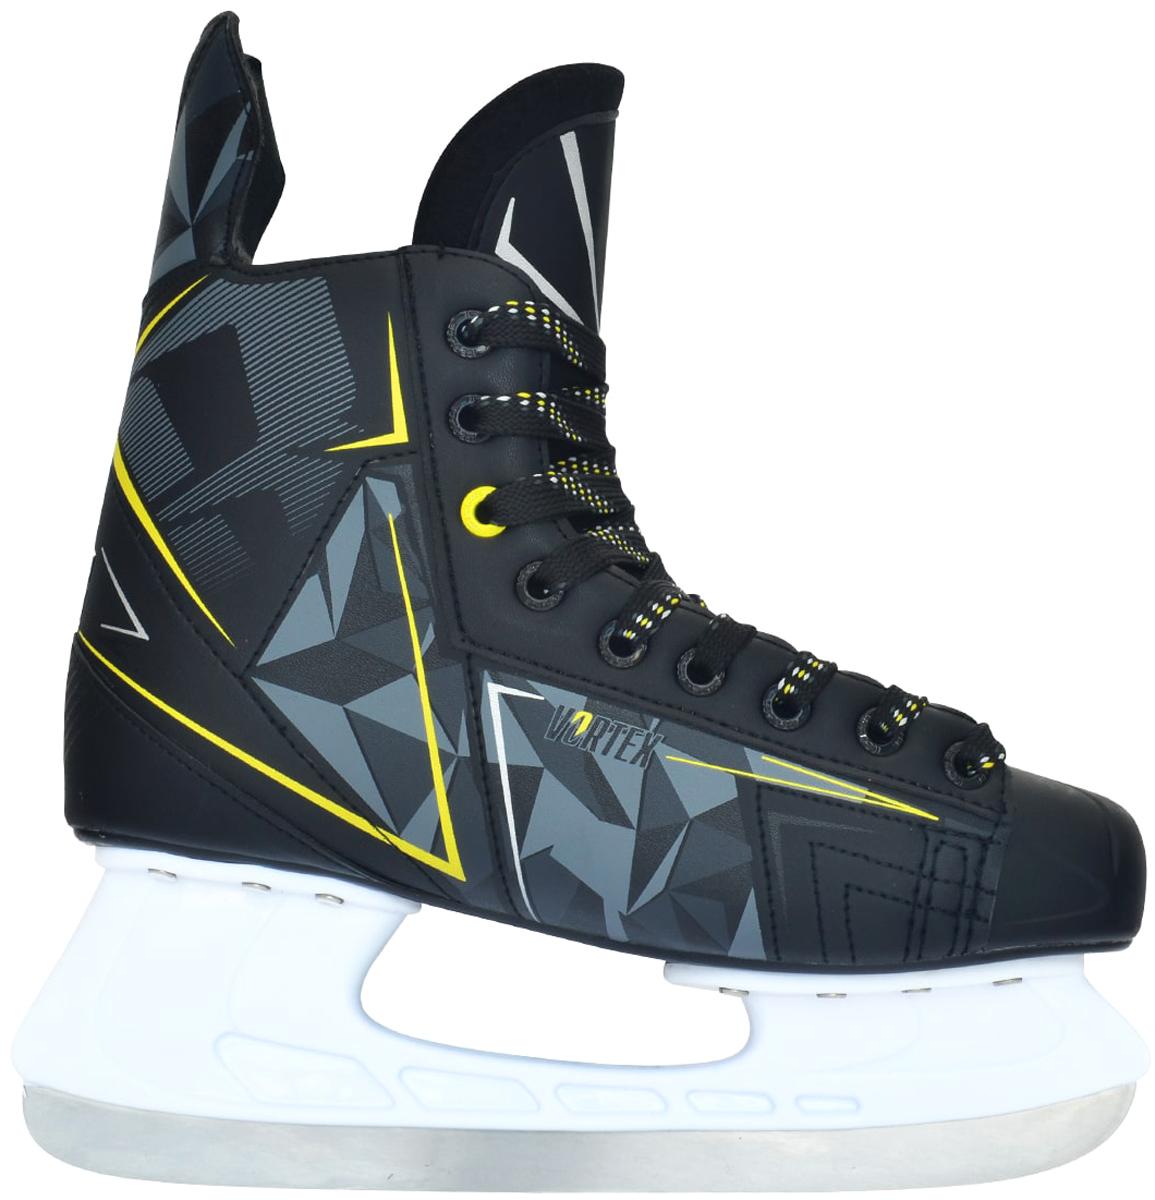 "Коньки хоккейные мужские Ice Blade ""Vortex"", цвет: серый, желтый, белый. Размер 45"